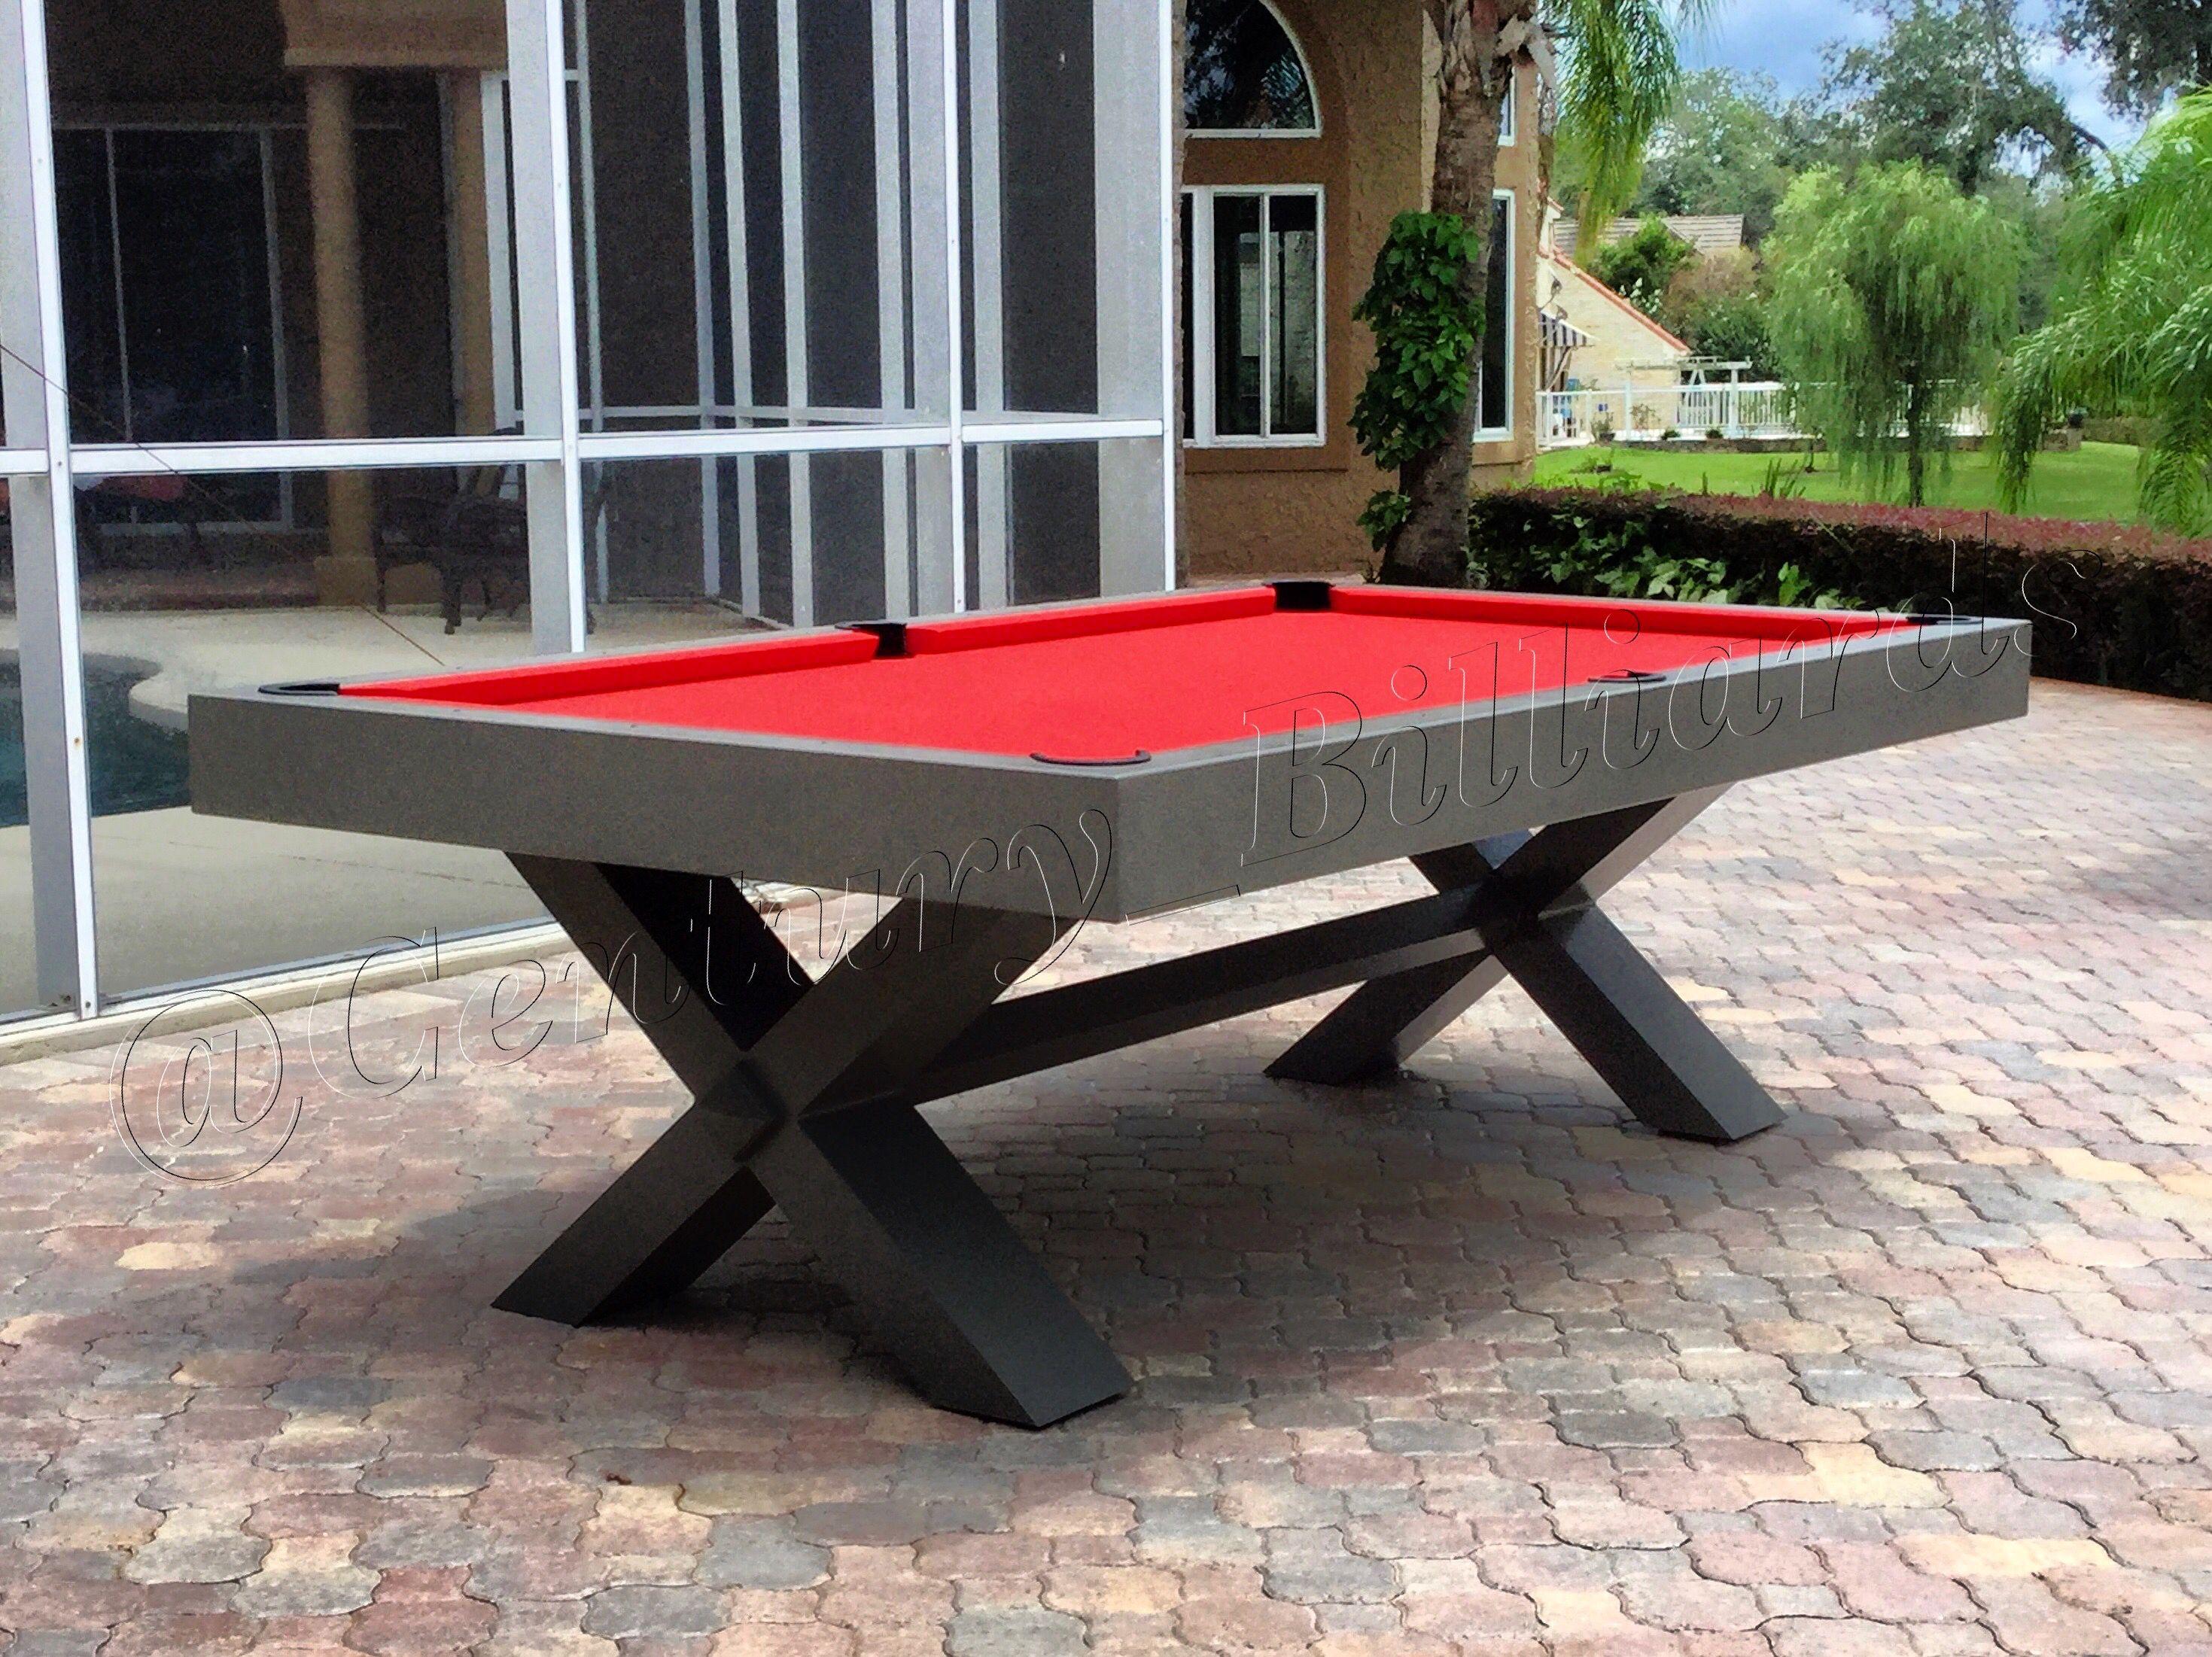 Industrial Yet Modern Outdoor Pool Table Outdoor Pool Table Outdoor Pool Modern Outdoor Modern outdoor pool table